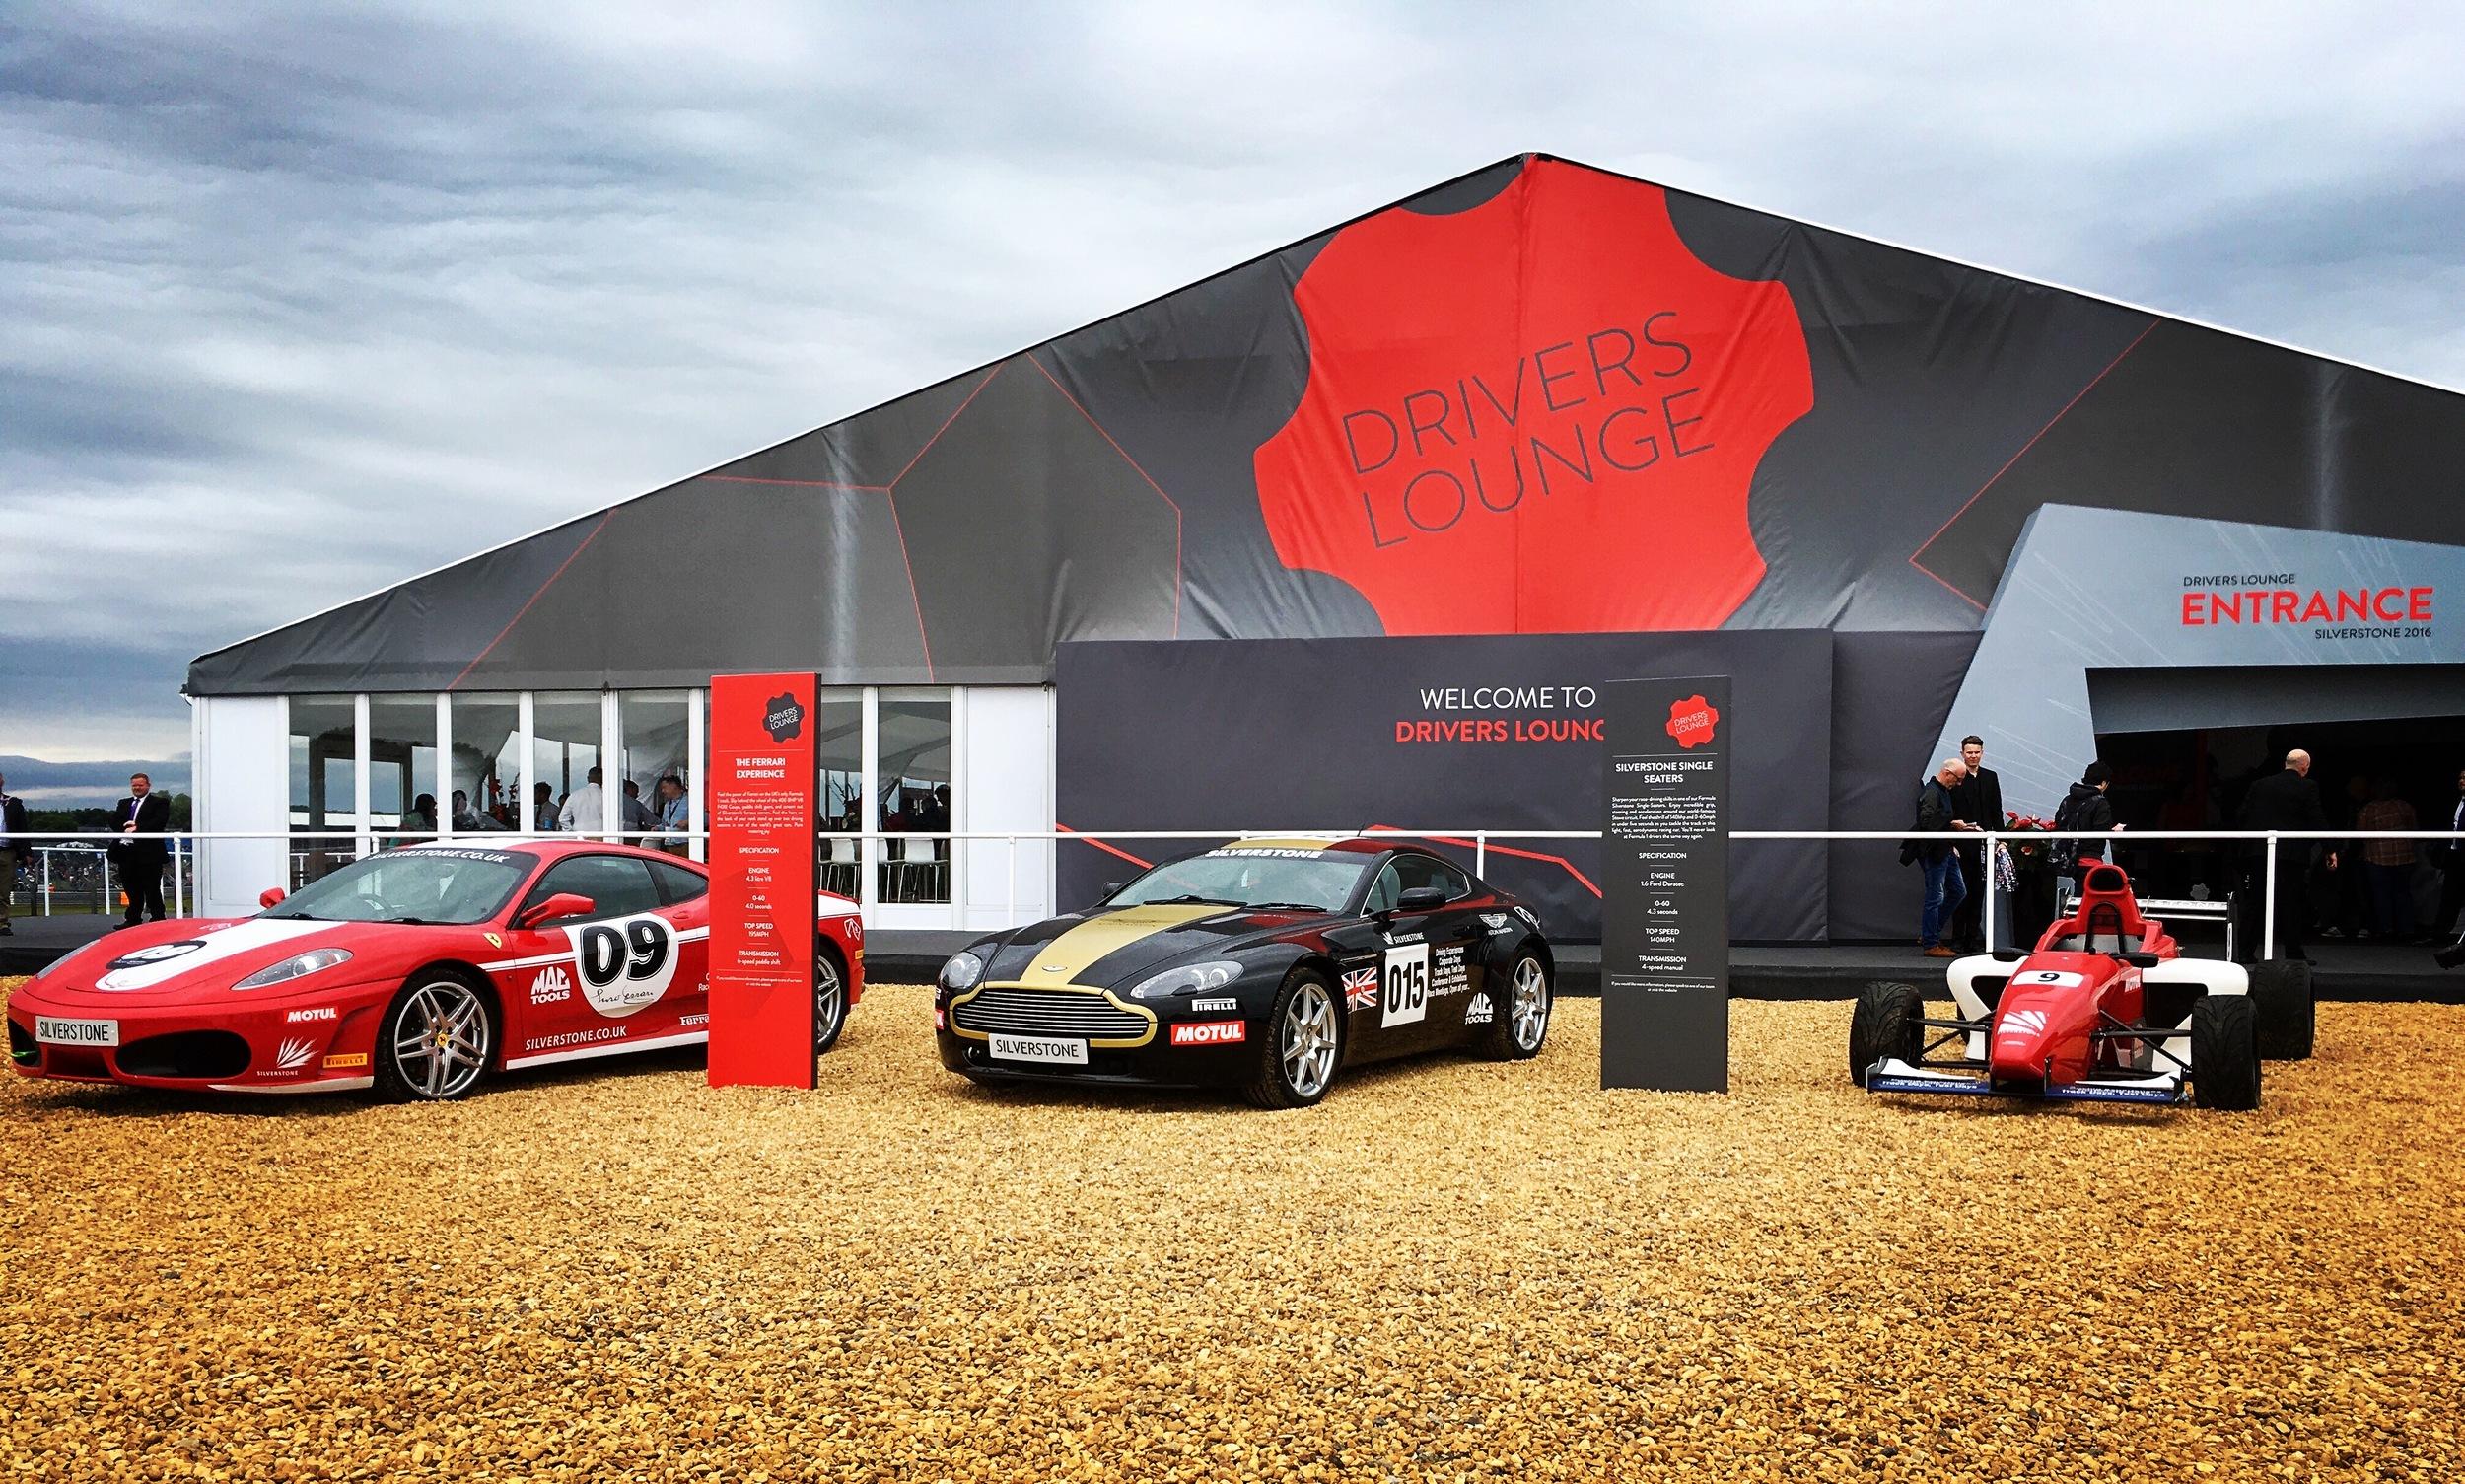 F1 drivers lounge